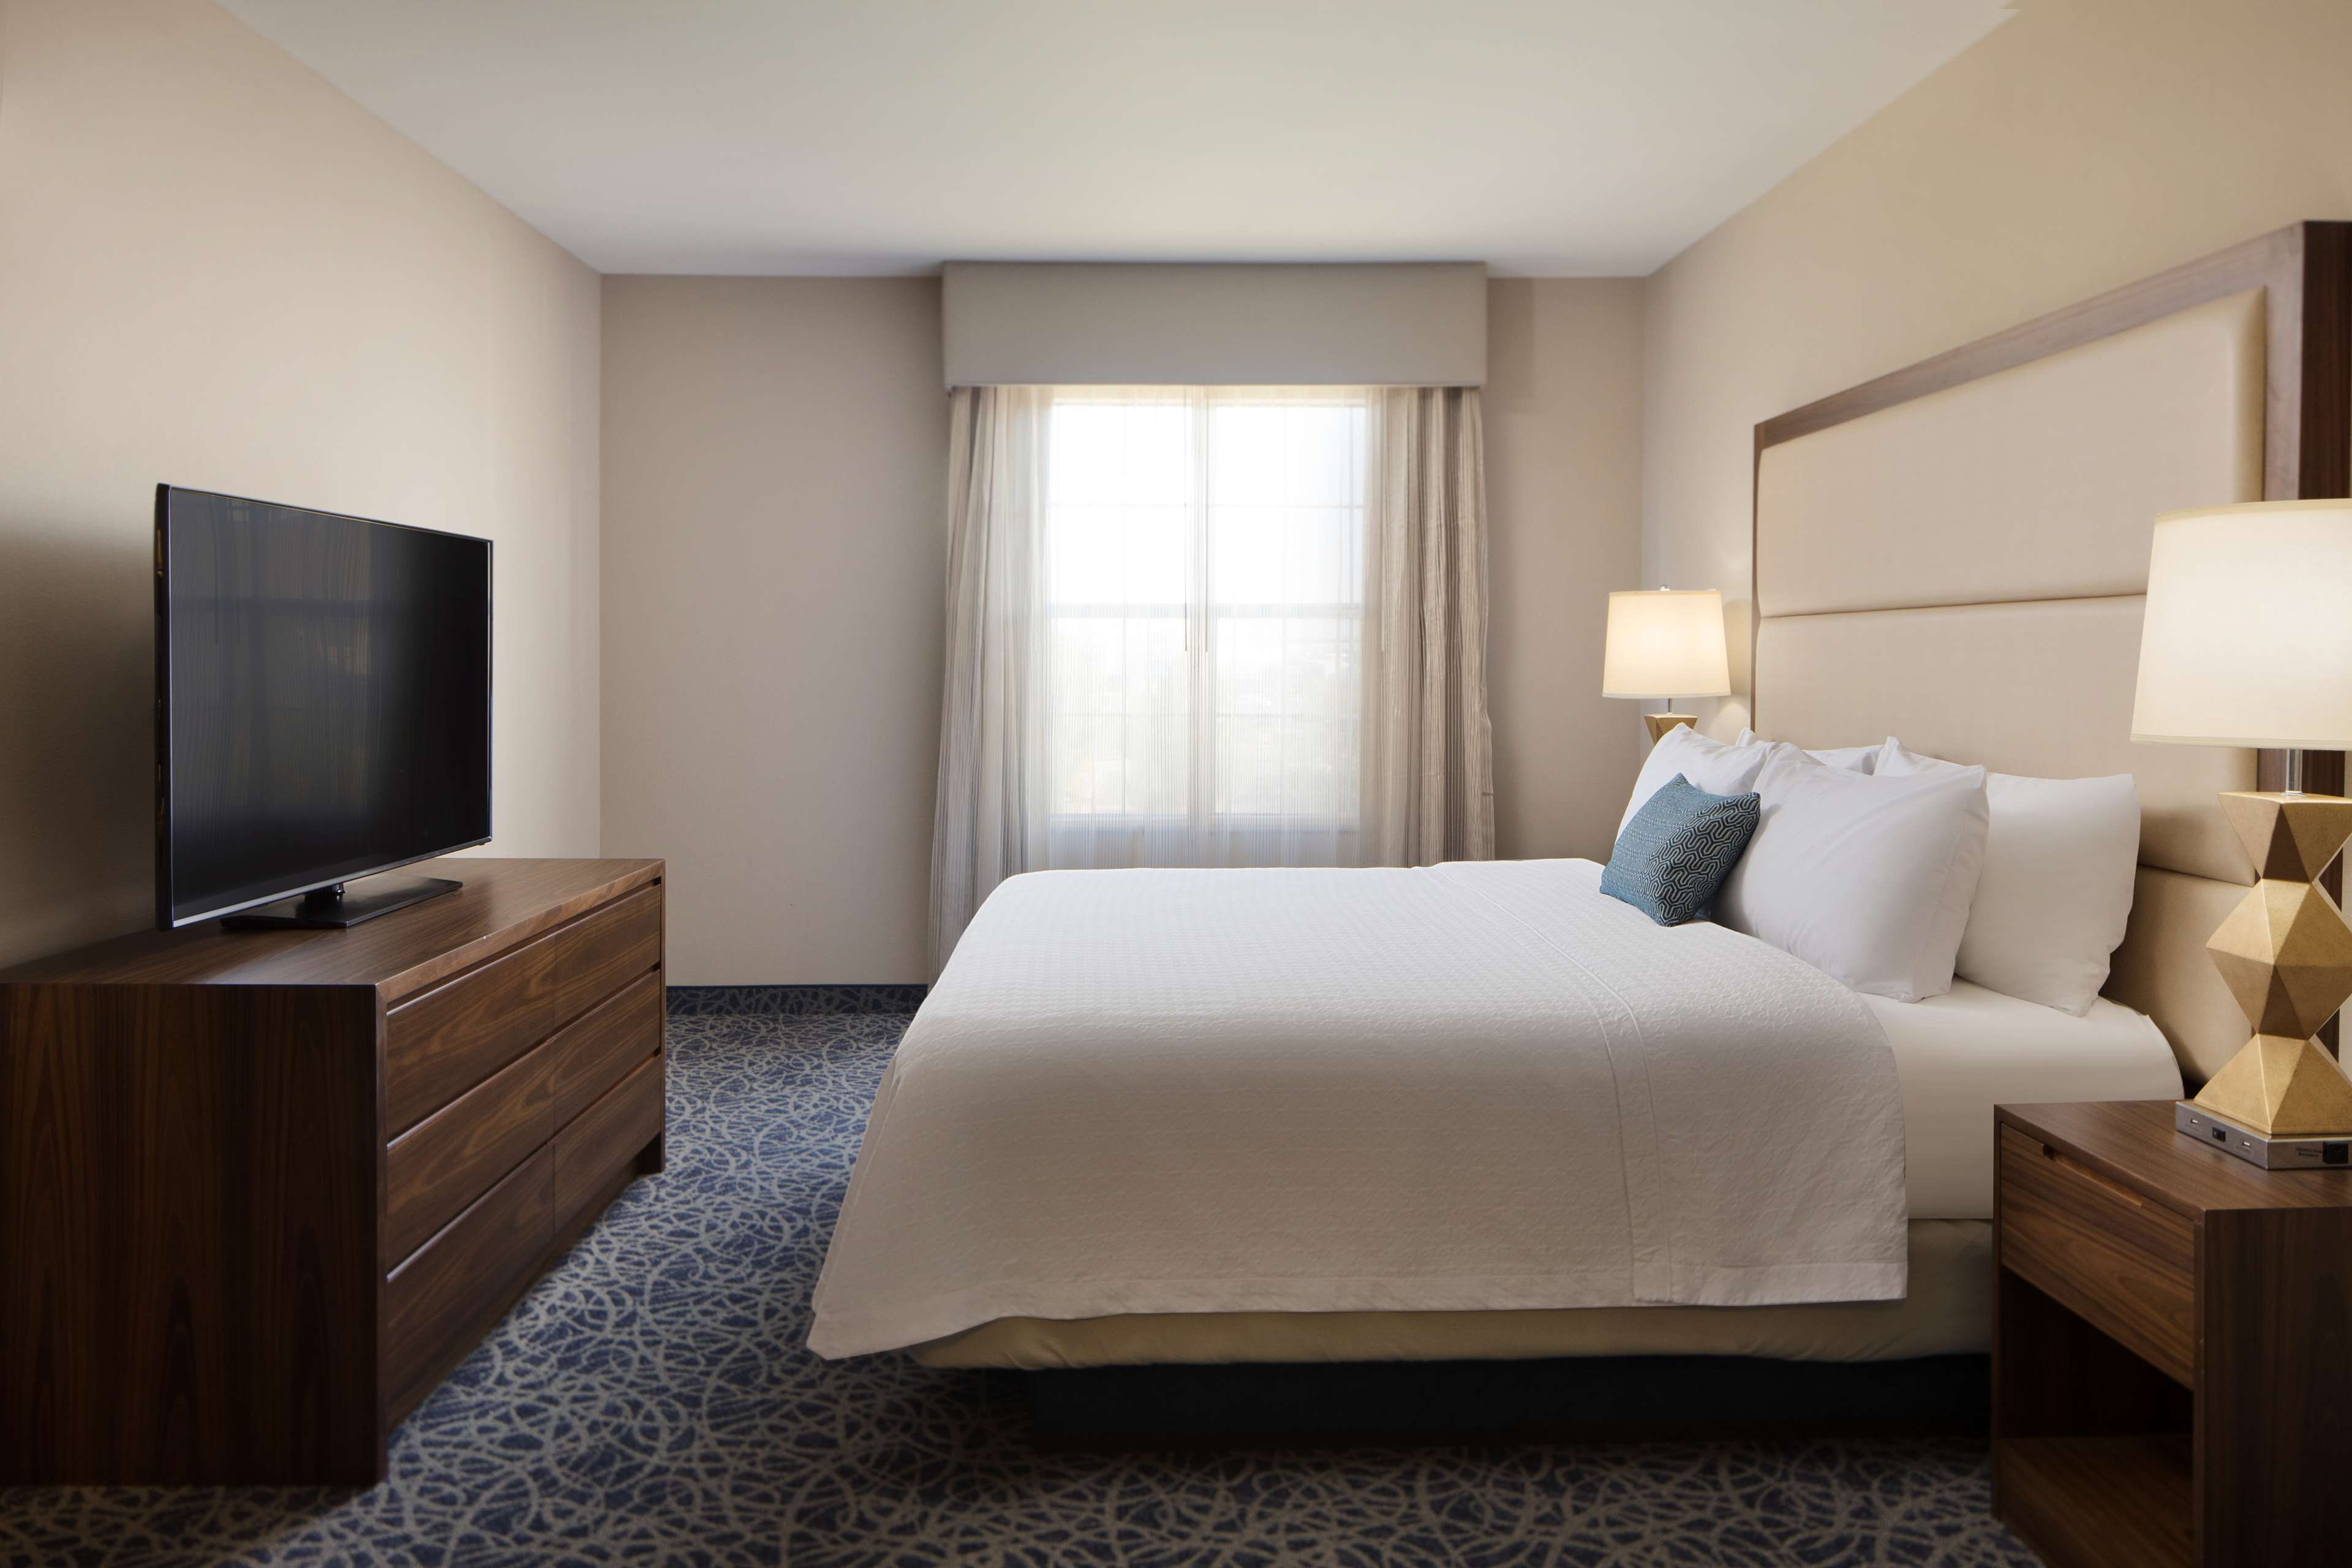 Homewood Suites by Hilton Lubbock image 20